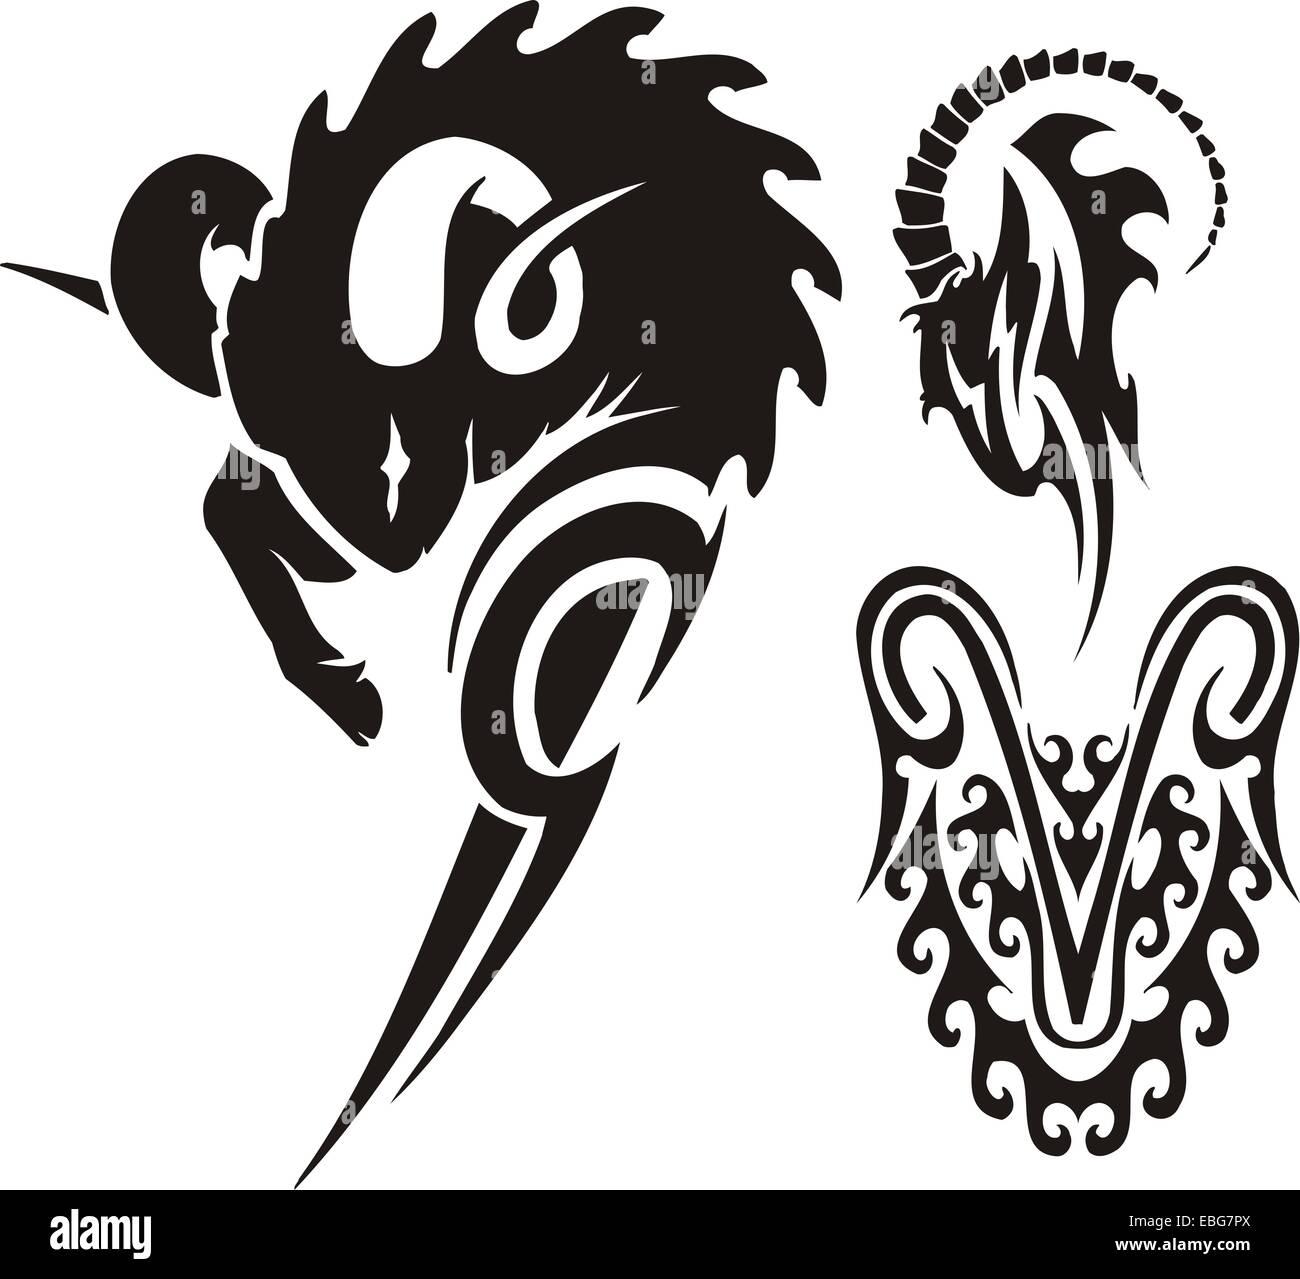 Zodiac Signs - aries. Vinyl-ready vector set. - Stock Image